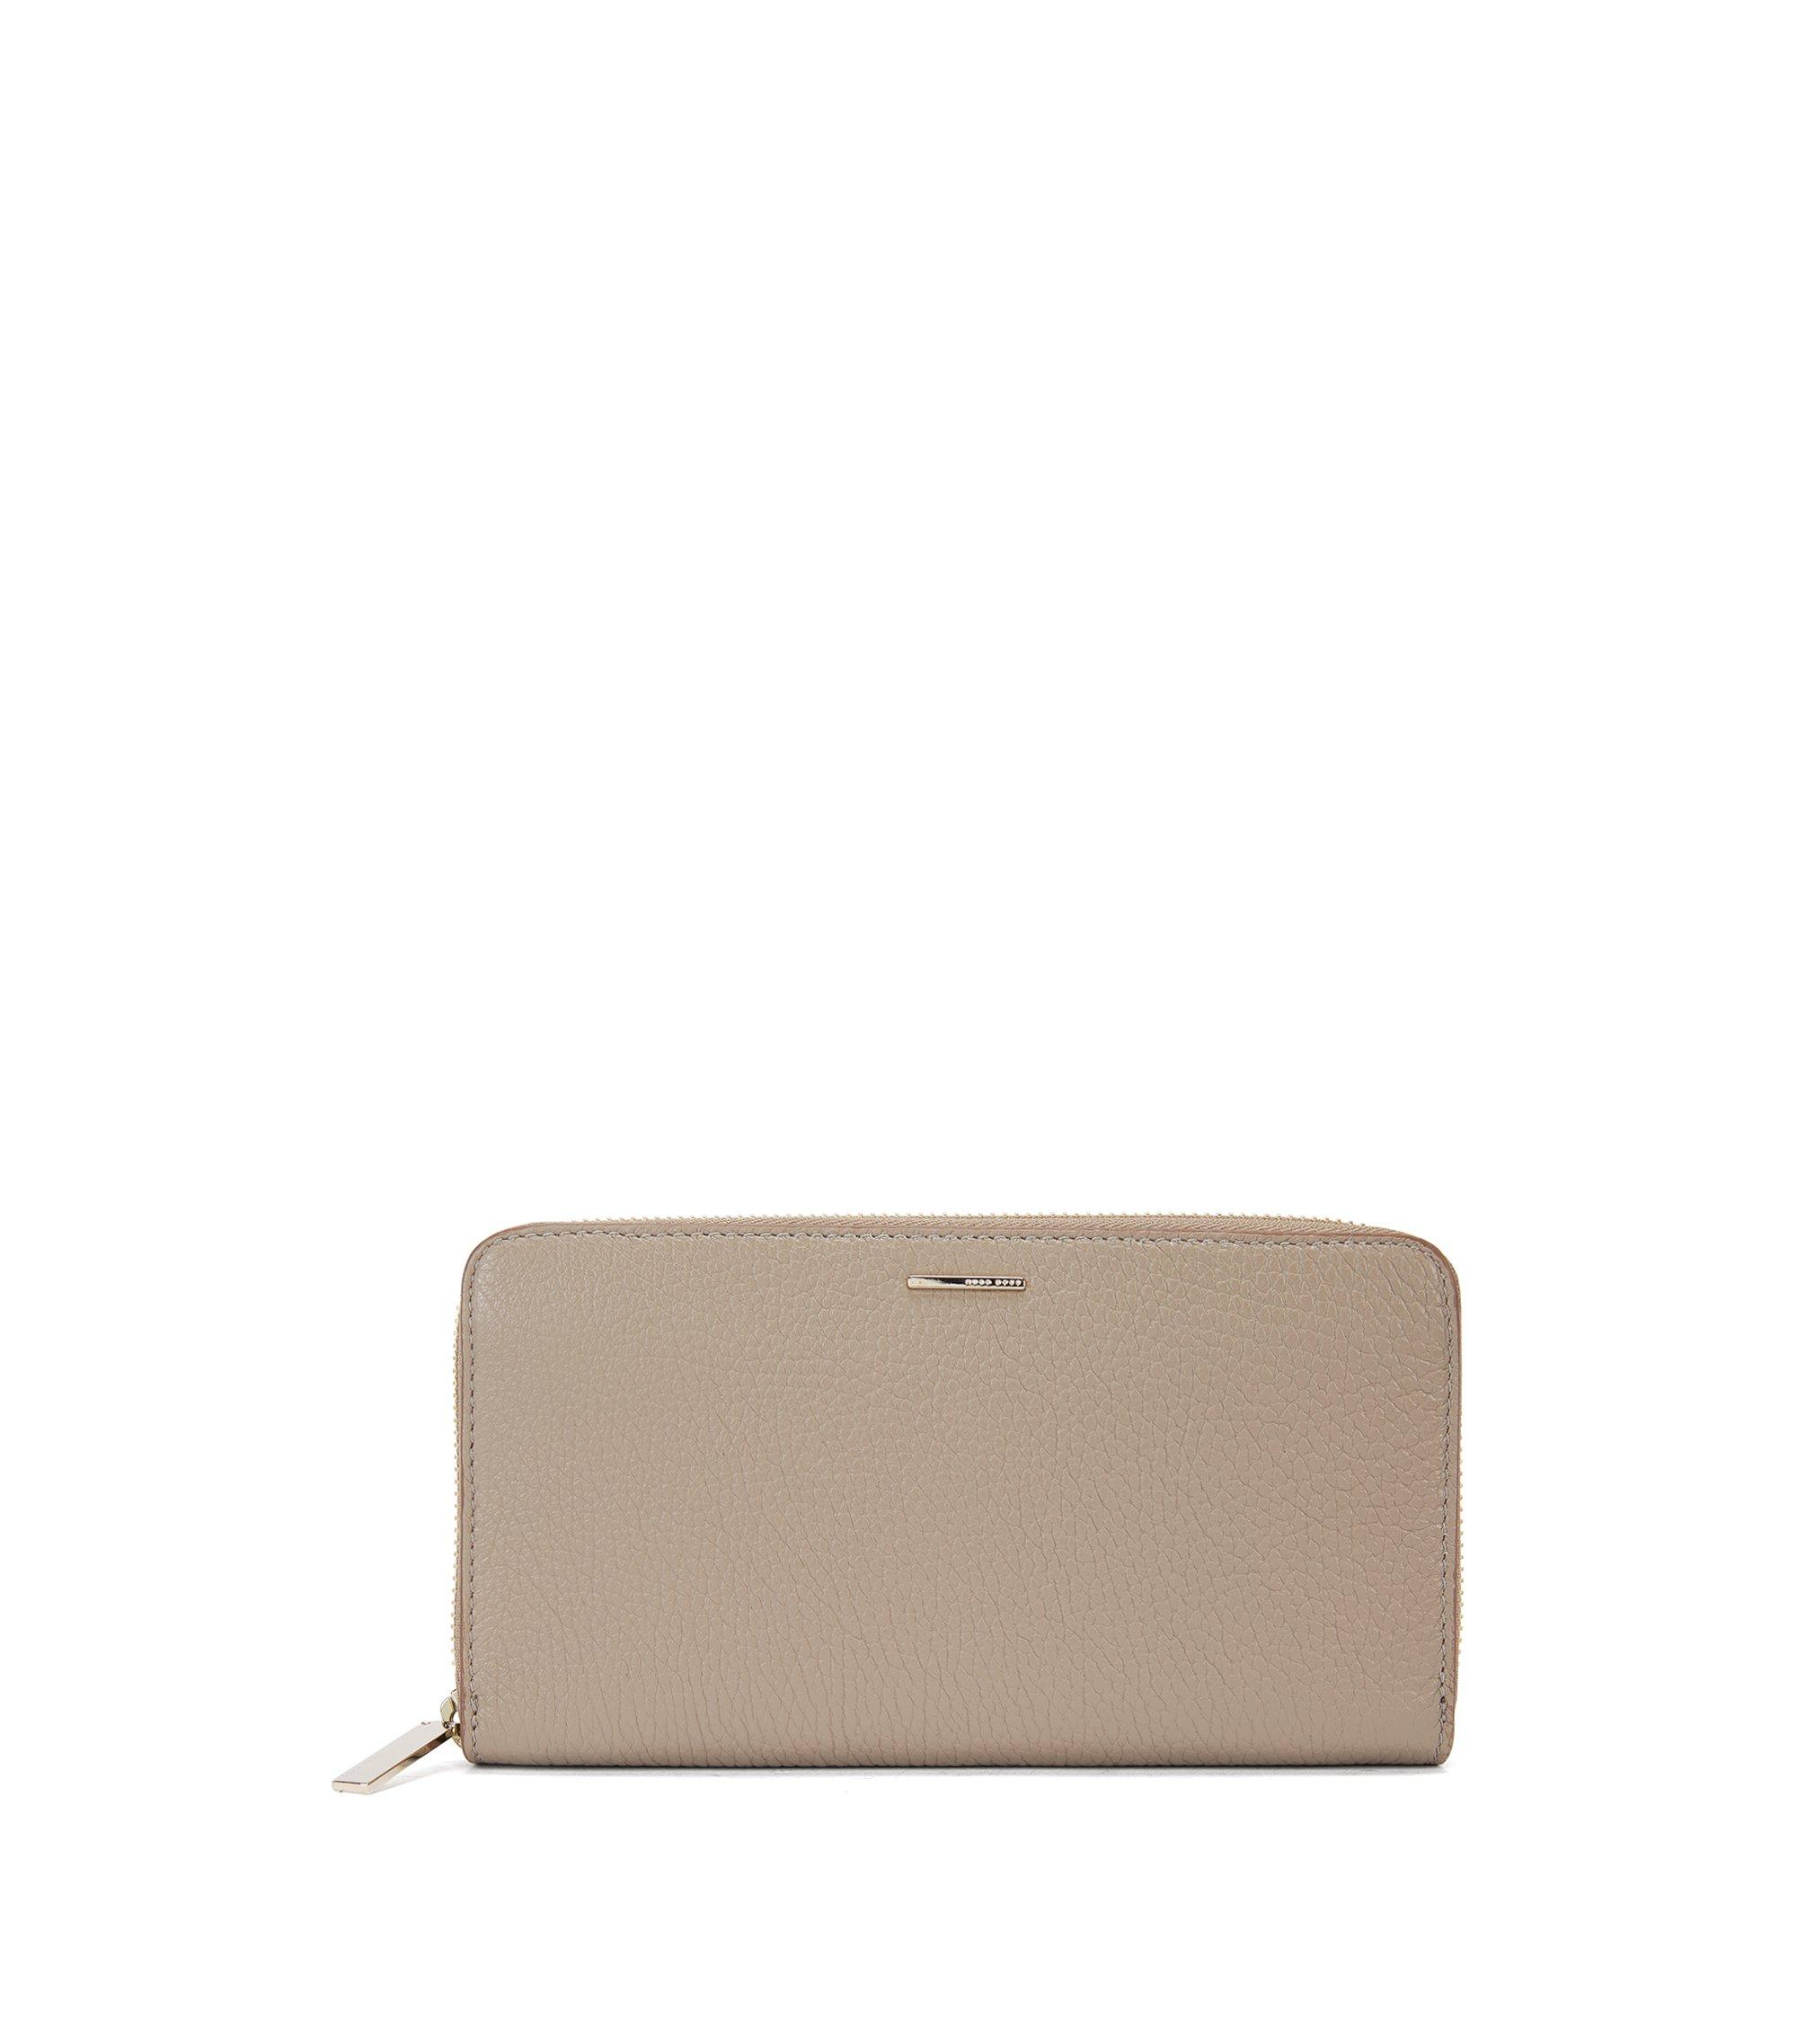 Leather Embossed Zip Wallet | Staple Ziparound A, Beige